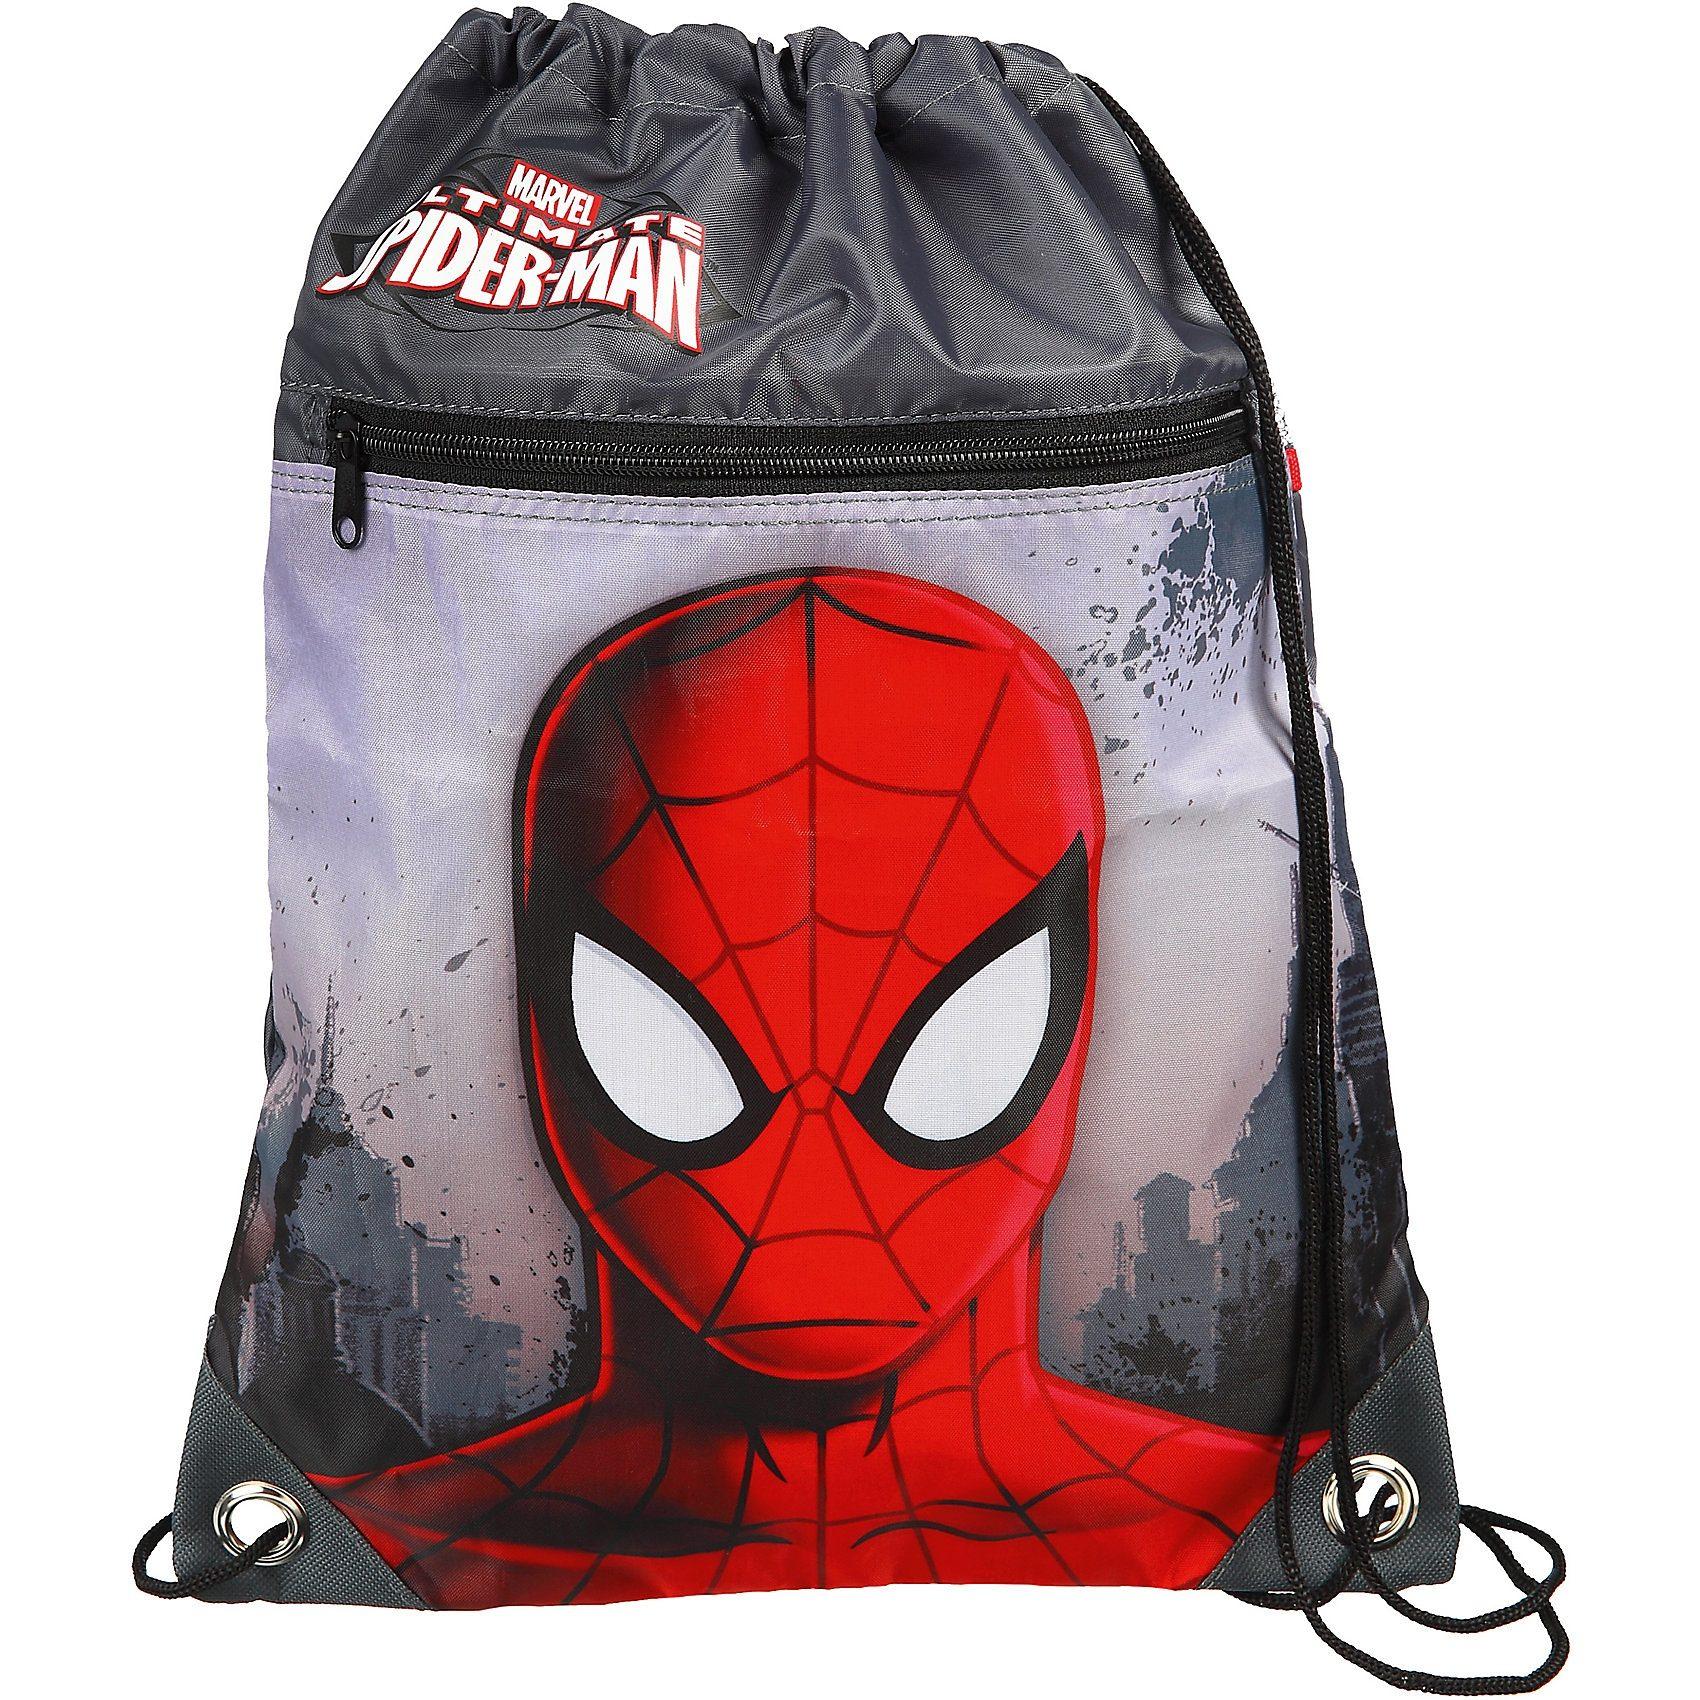 UNDERCOVER Sportbeutel Spider Man